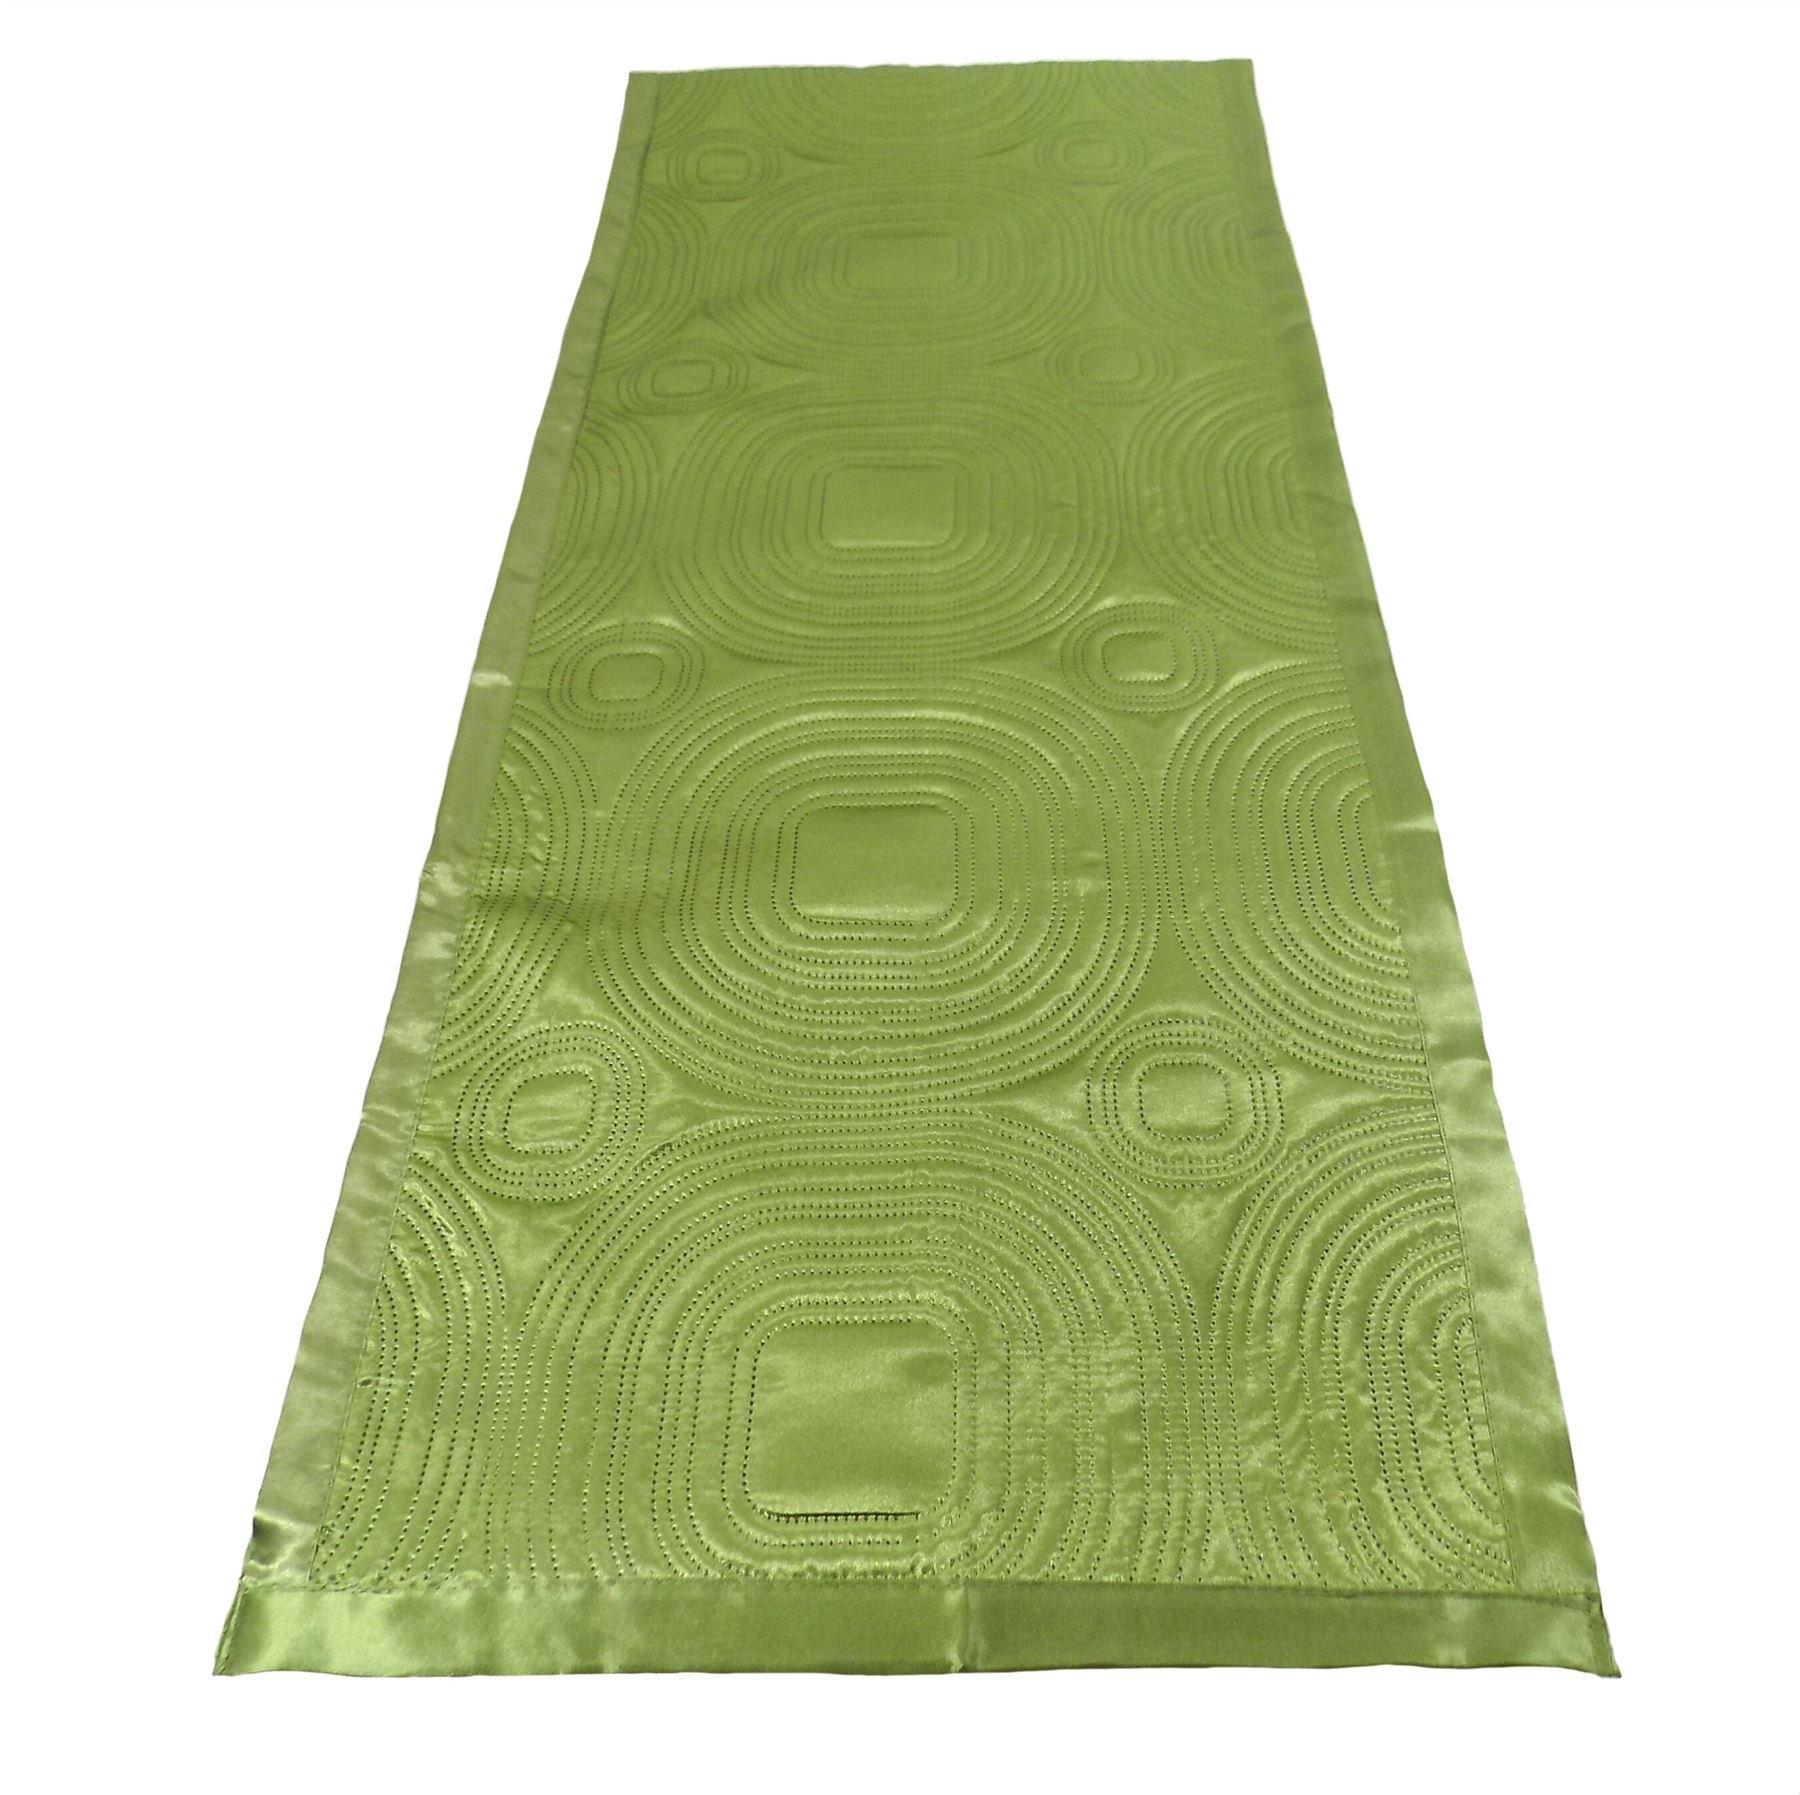 LUXURIOUS GREEN SATIN EMBOSSED LONG BEDROOM BED RUNNER 45 X 220CM - 18'' X 86''